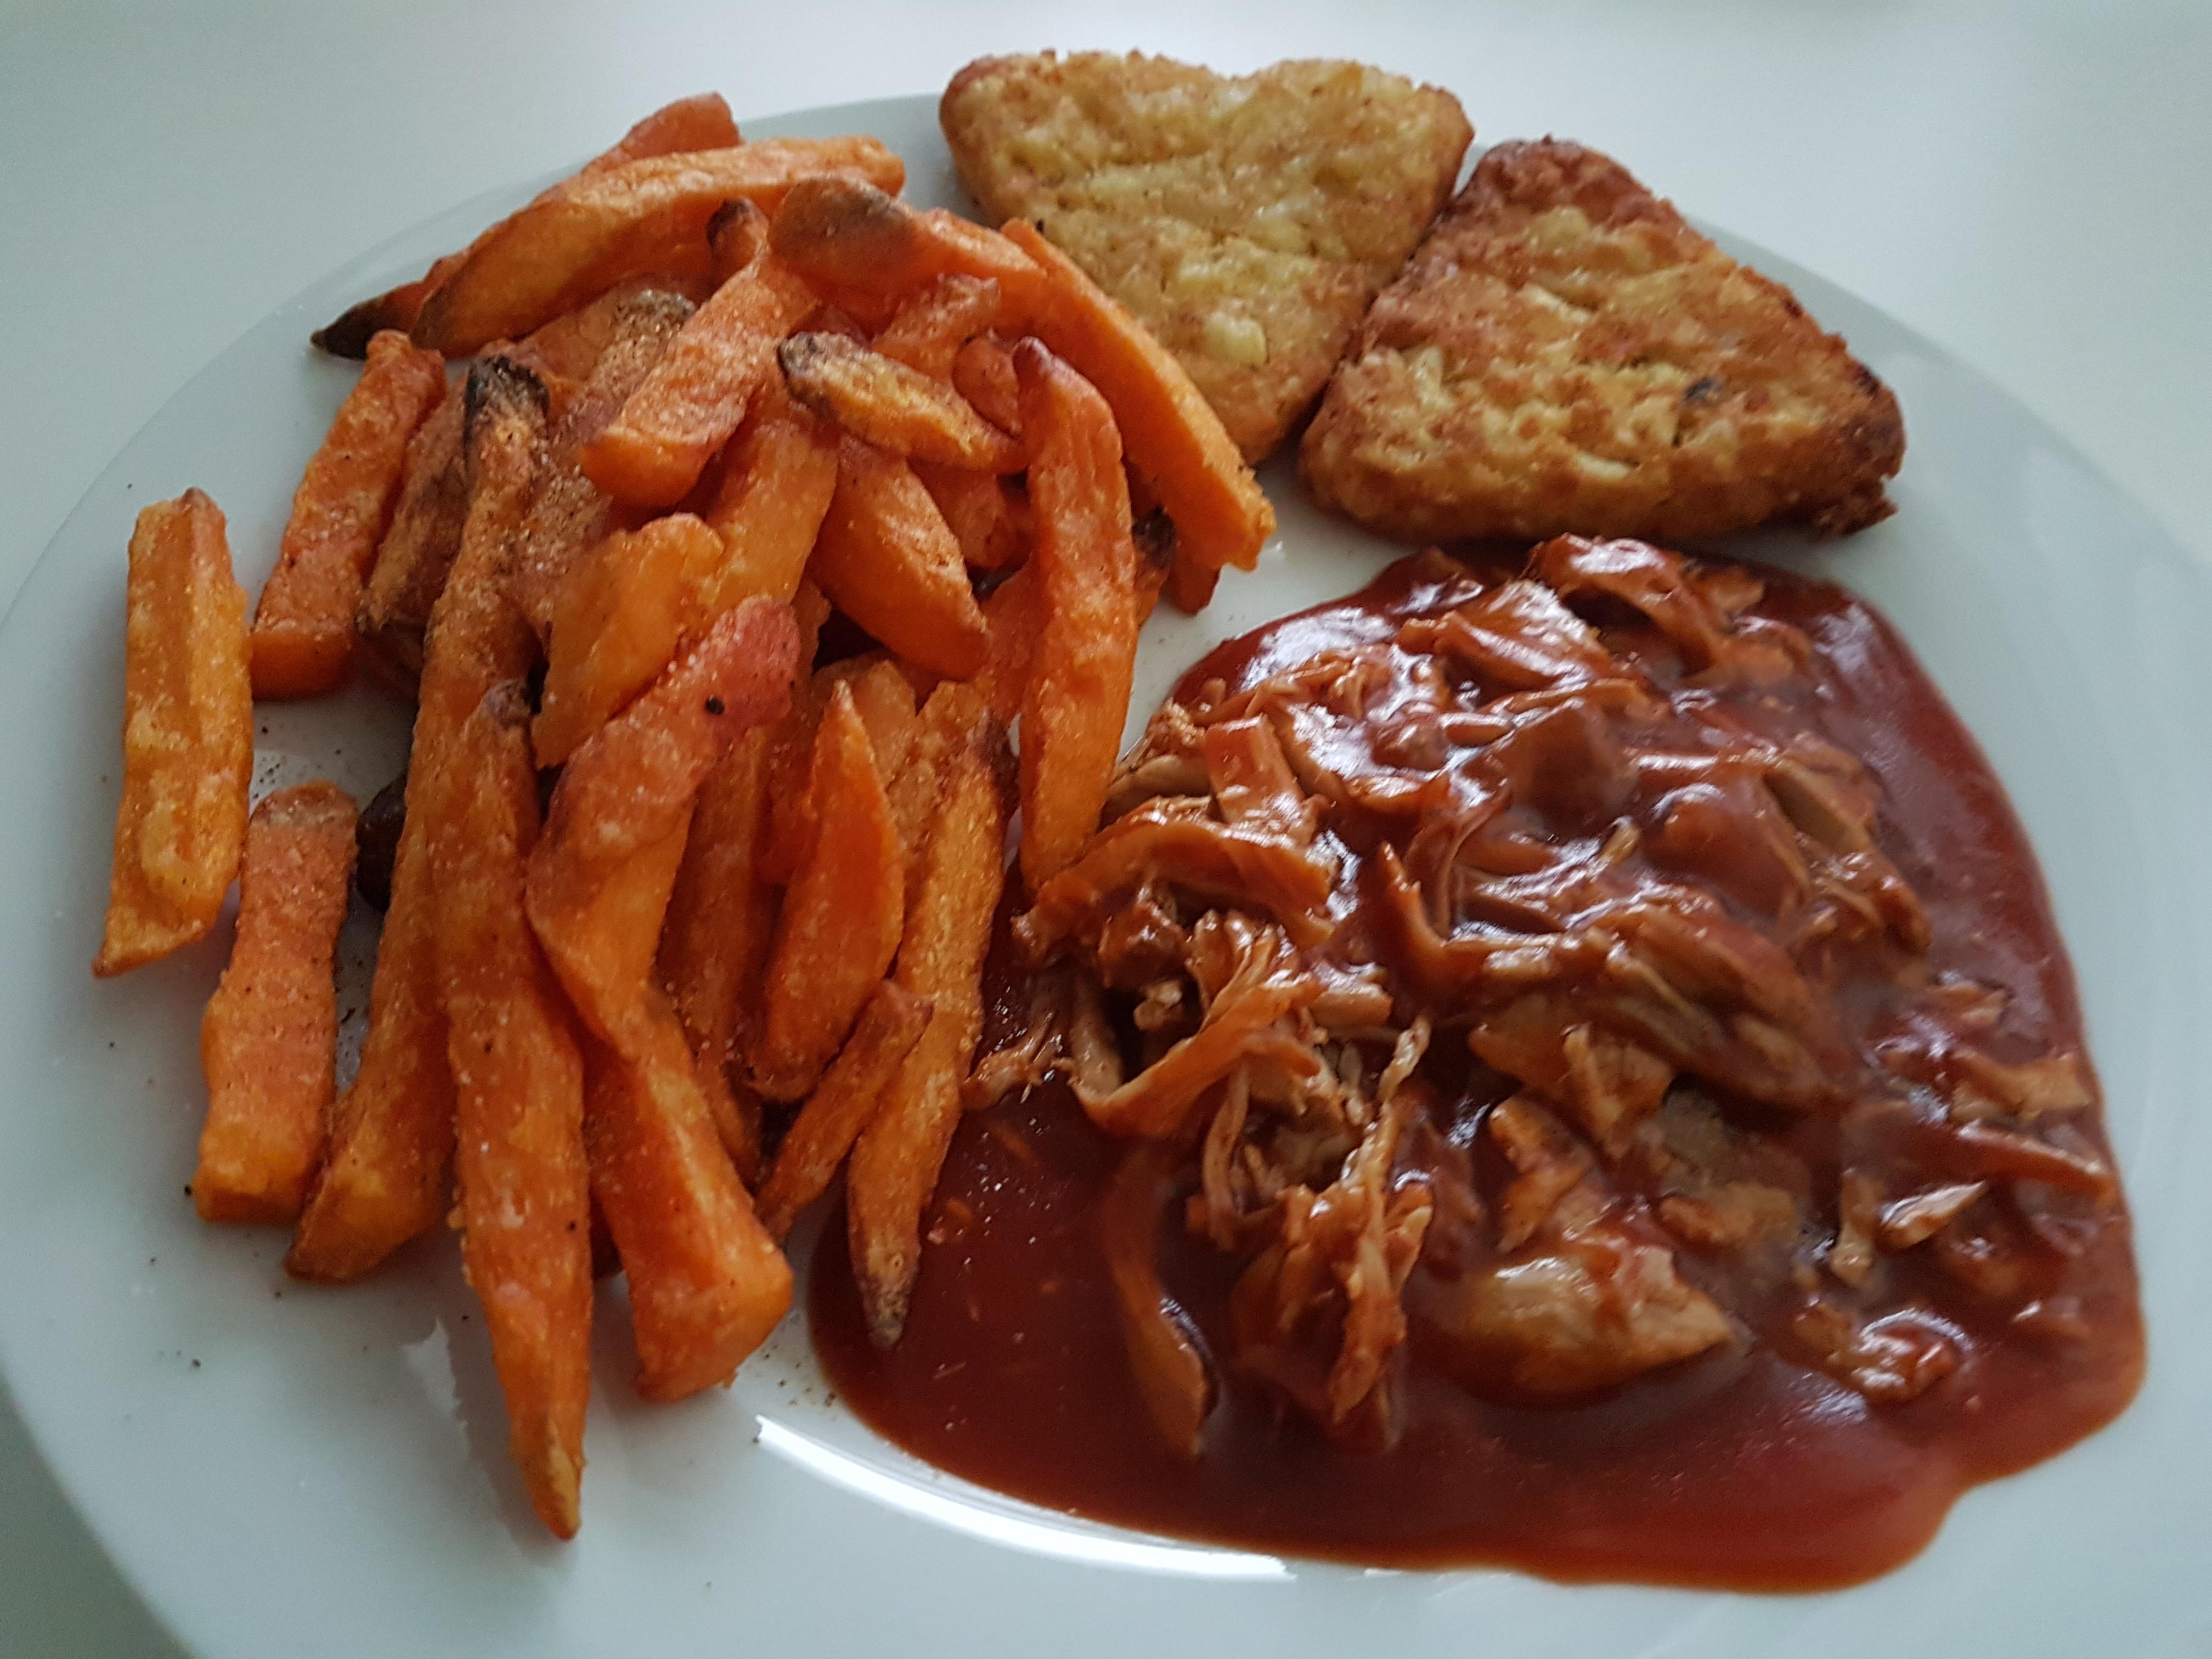 http://foodloader.net/Holz_2018-01-21_Pulled_Pork_mit_Suesskartoffelpommes.jpg